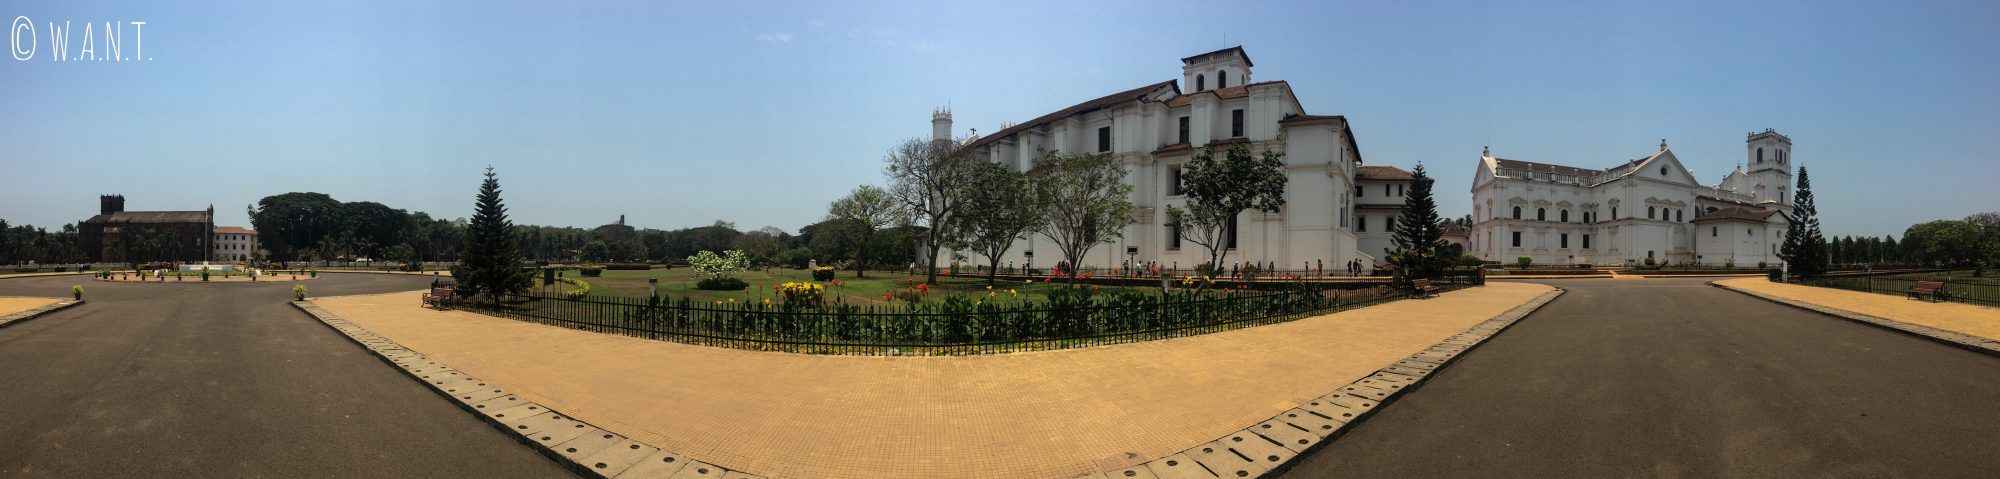 Panorama du site Unesco de Old Goa